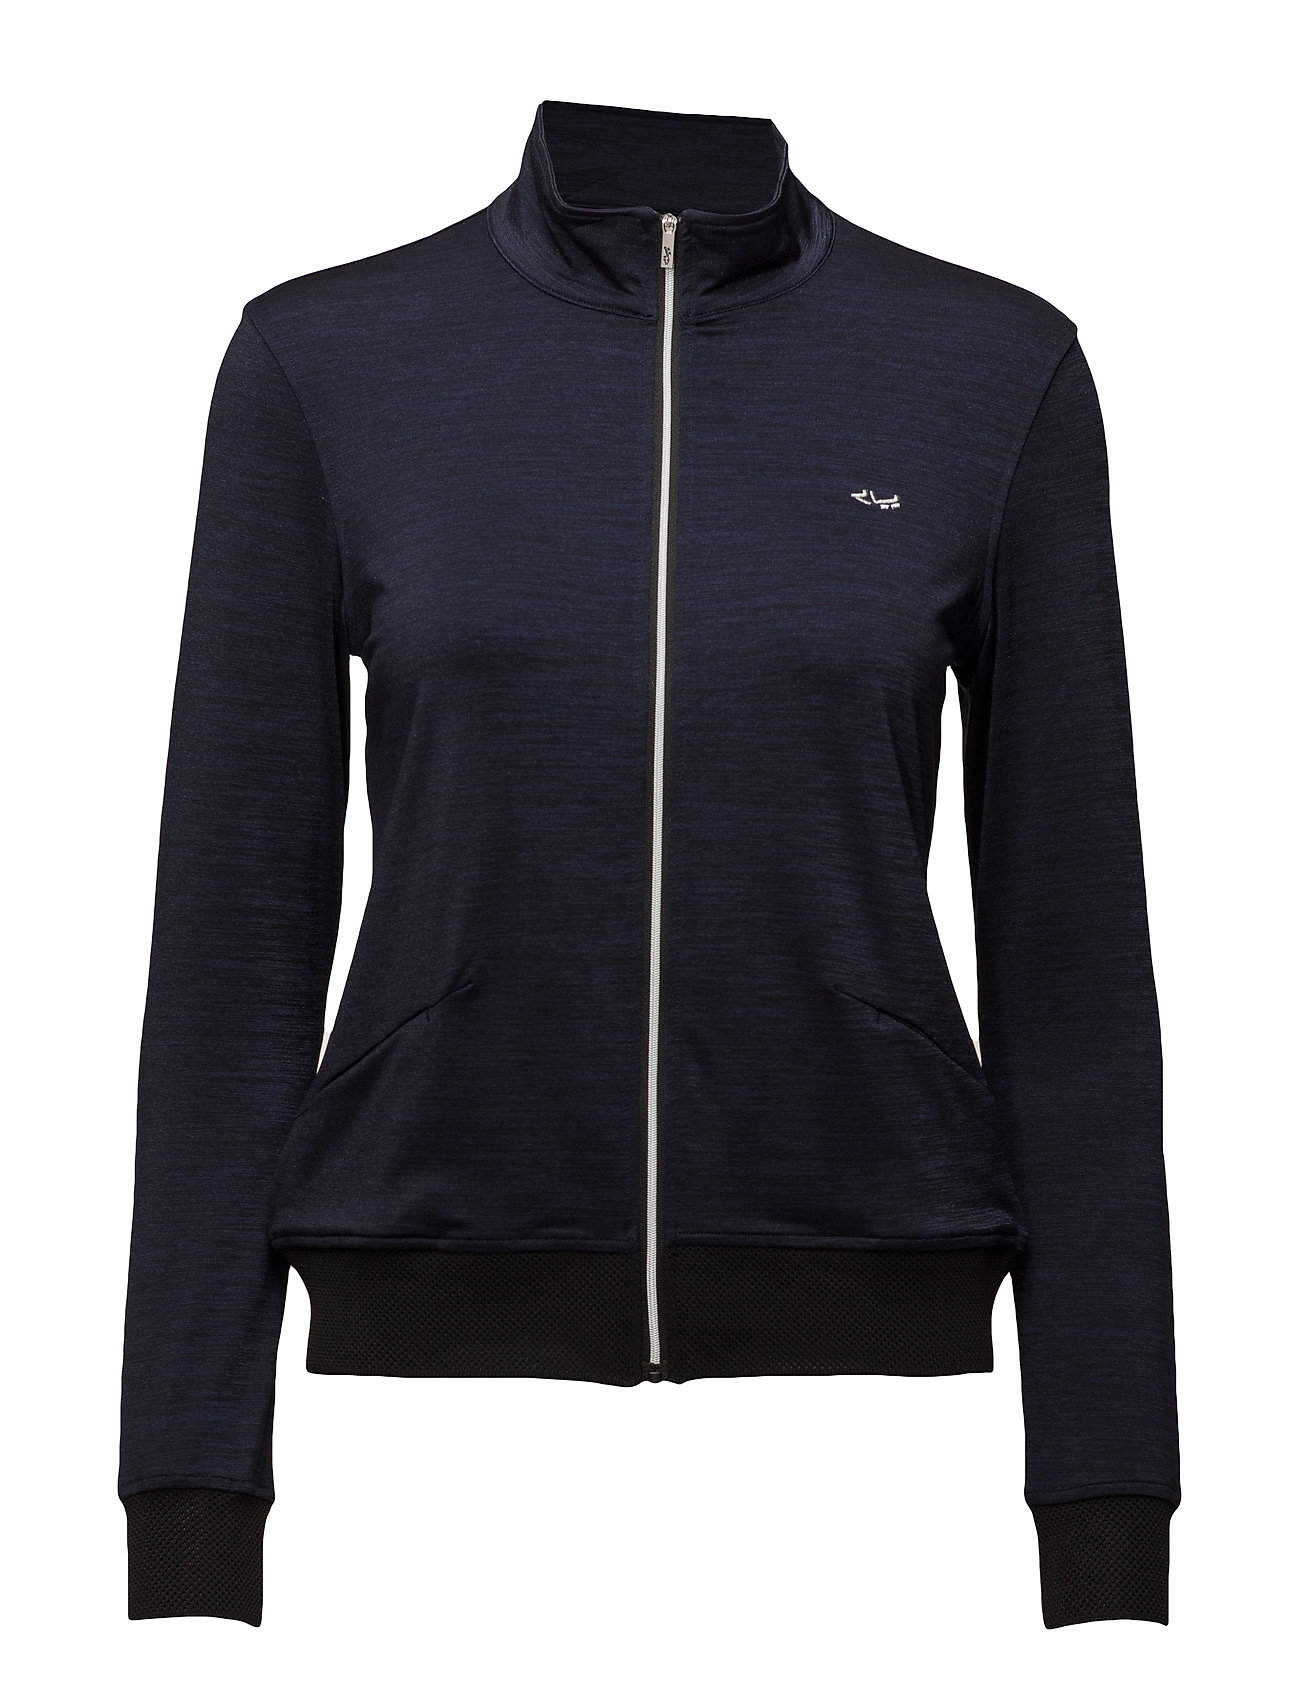 rã¶hnisch – Namaste jacket fra boozt.com dk